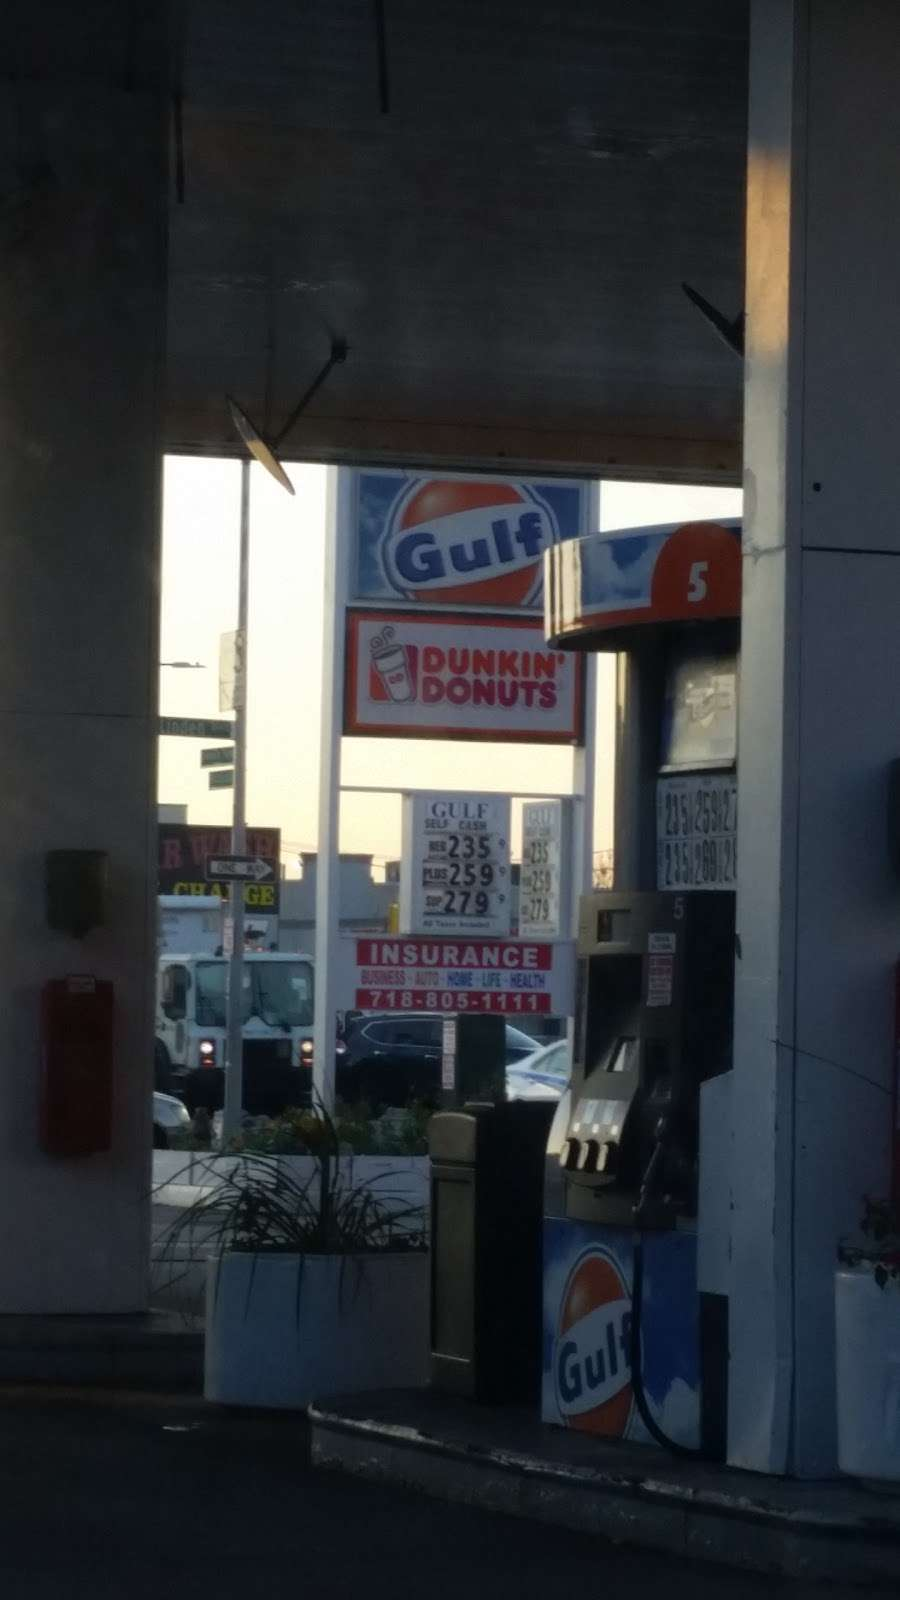 Dunkin Donuts - cafe    Photo 6 of 10   Address: Gulf Gas Station, 1939 Linden Blvd, Brooklyn, NY 11207, USA   Phone: (718) 272-5801